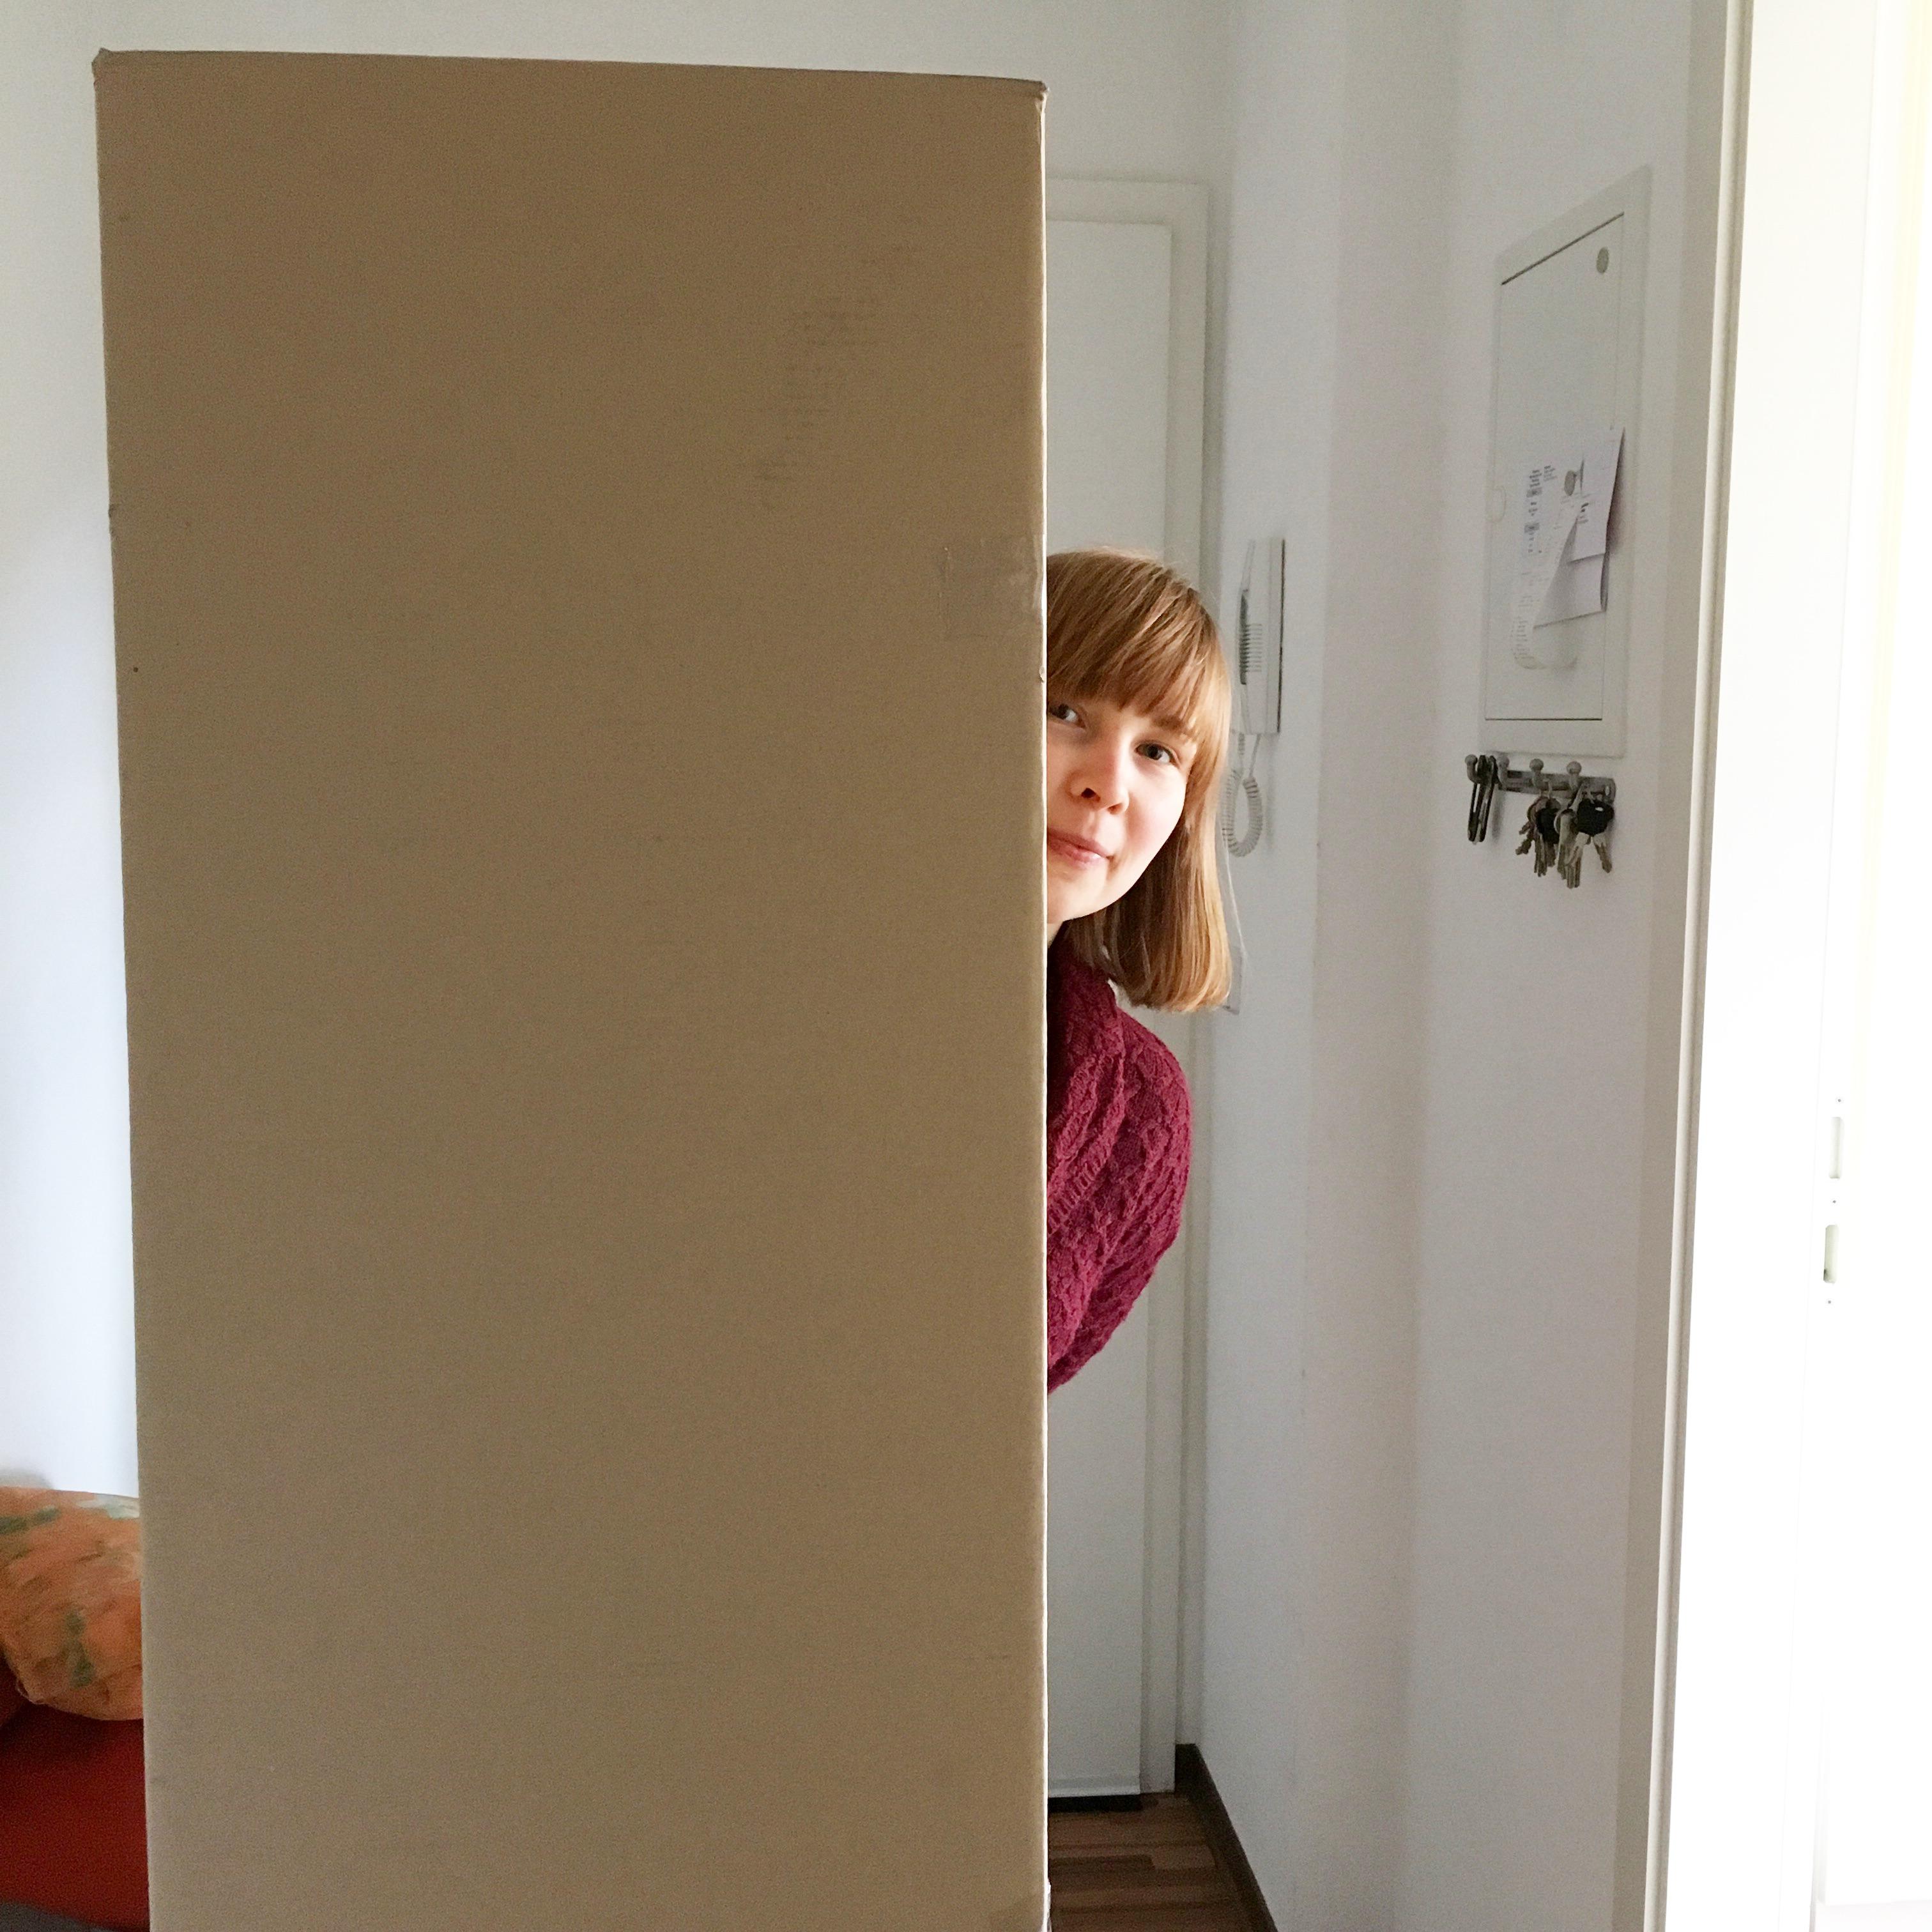 Frau lukt hinter Karton hervor